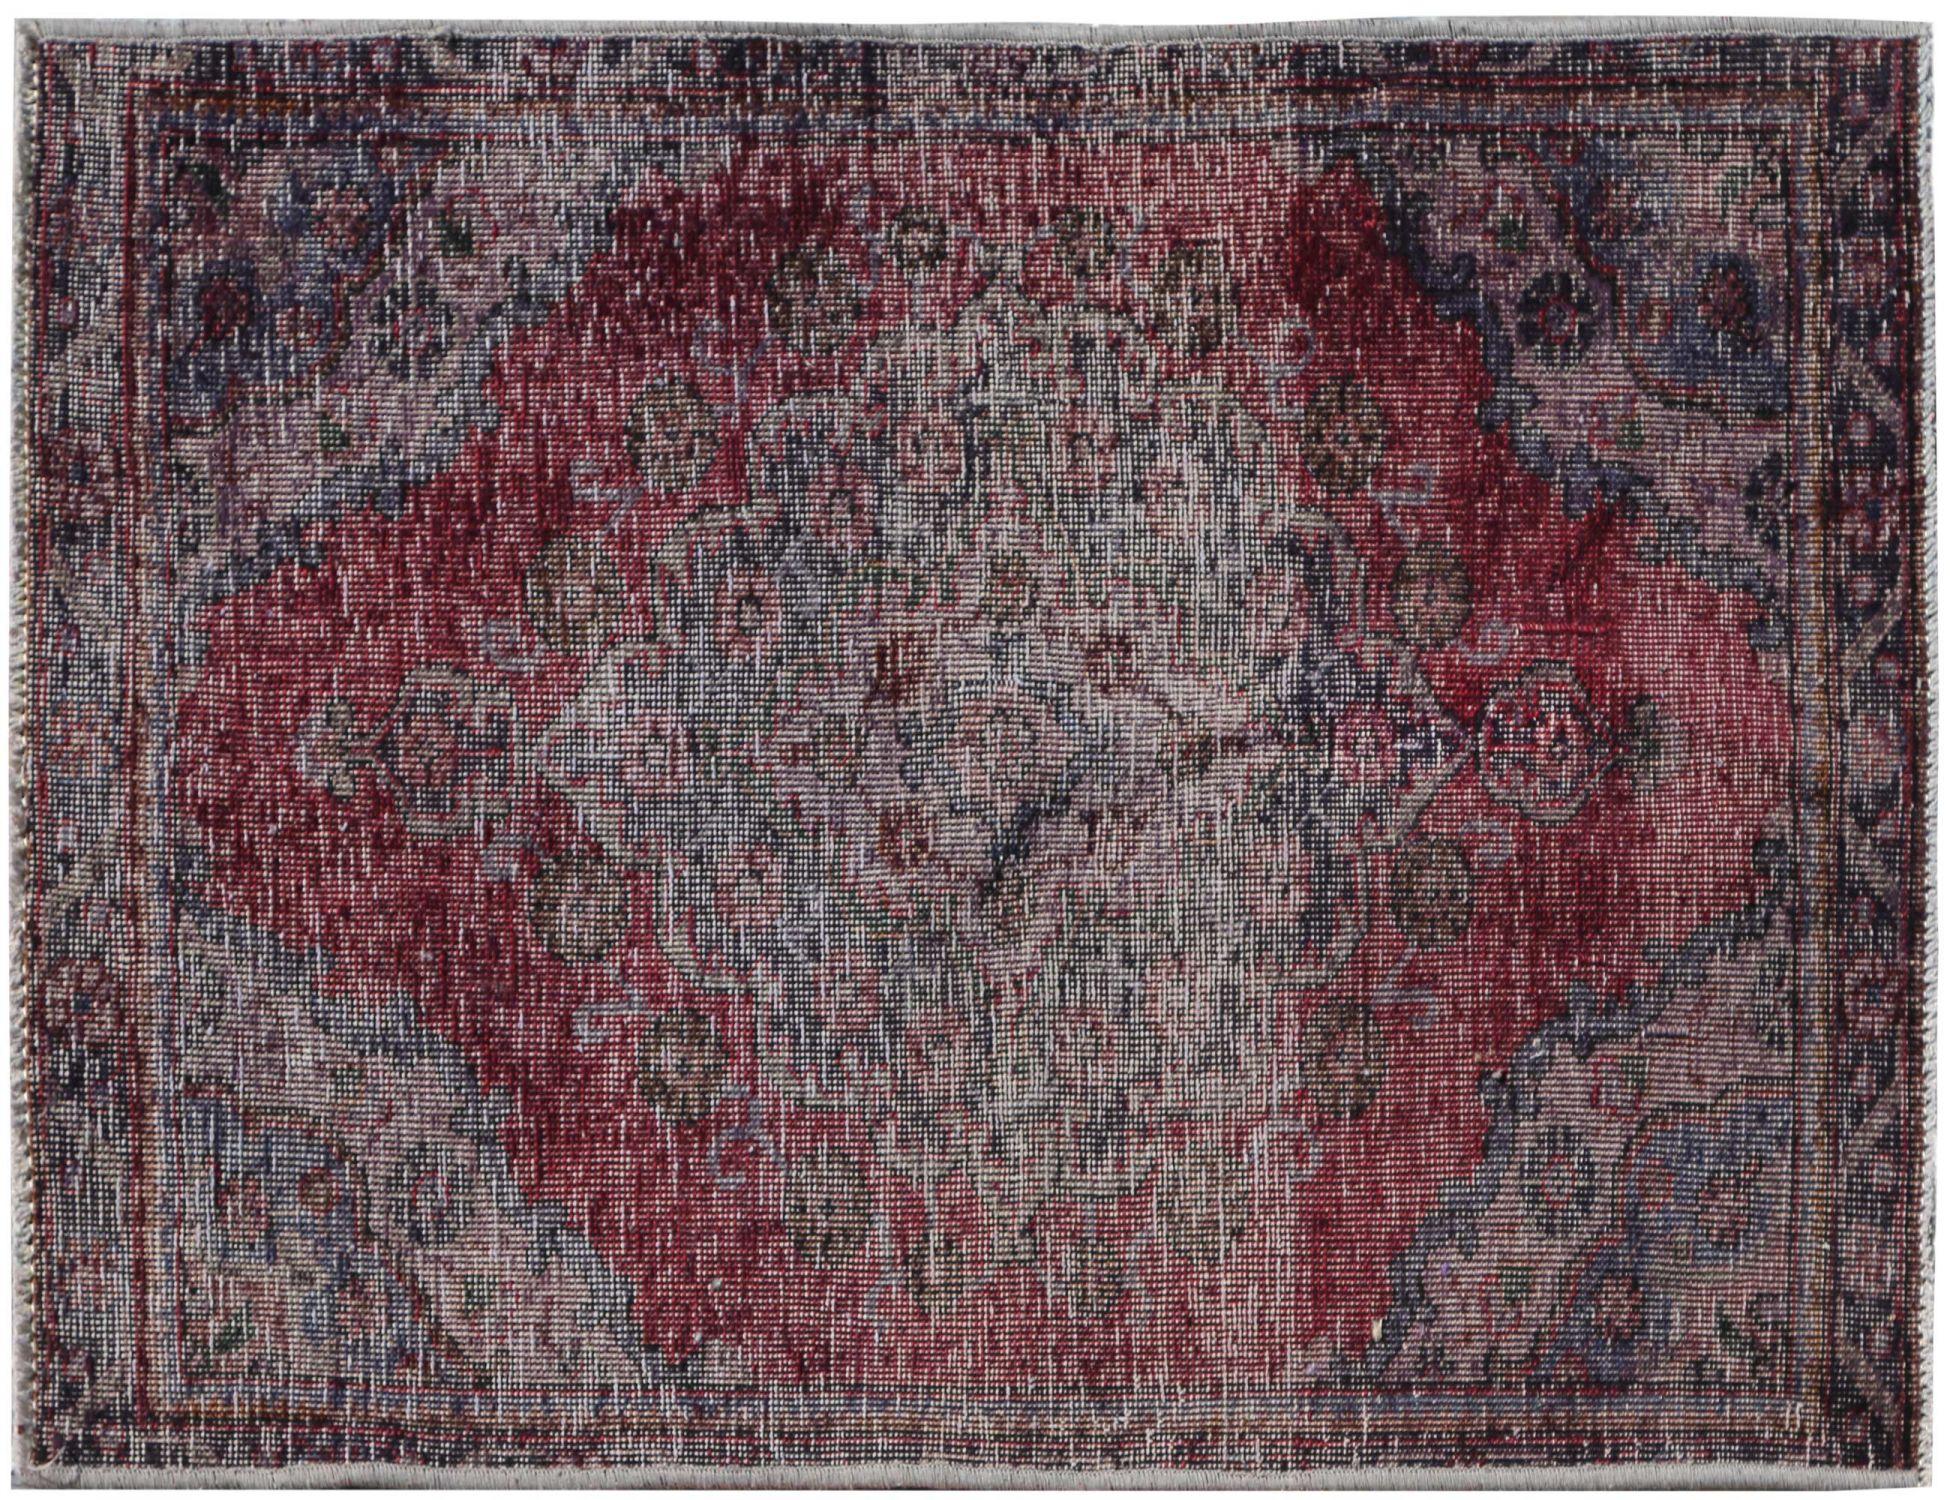 Vintage Carpet  violetti <br/>145 x 85 cm